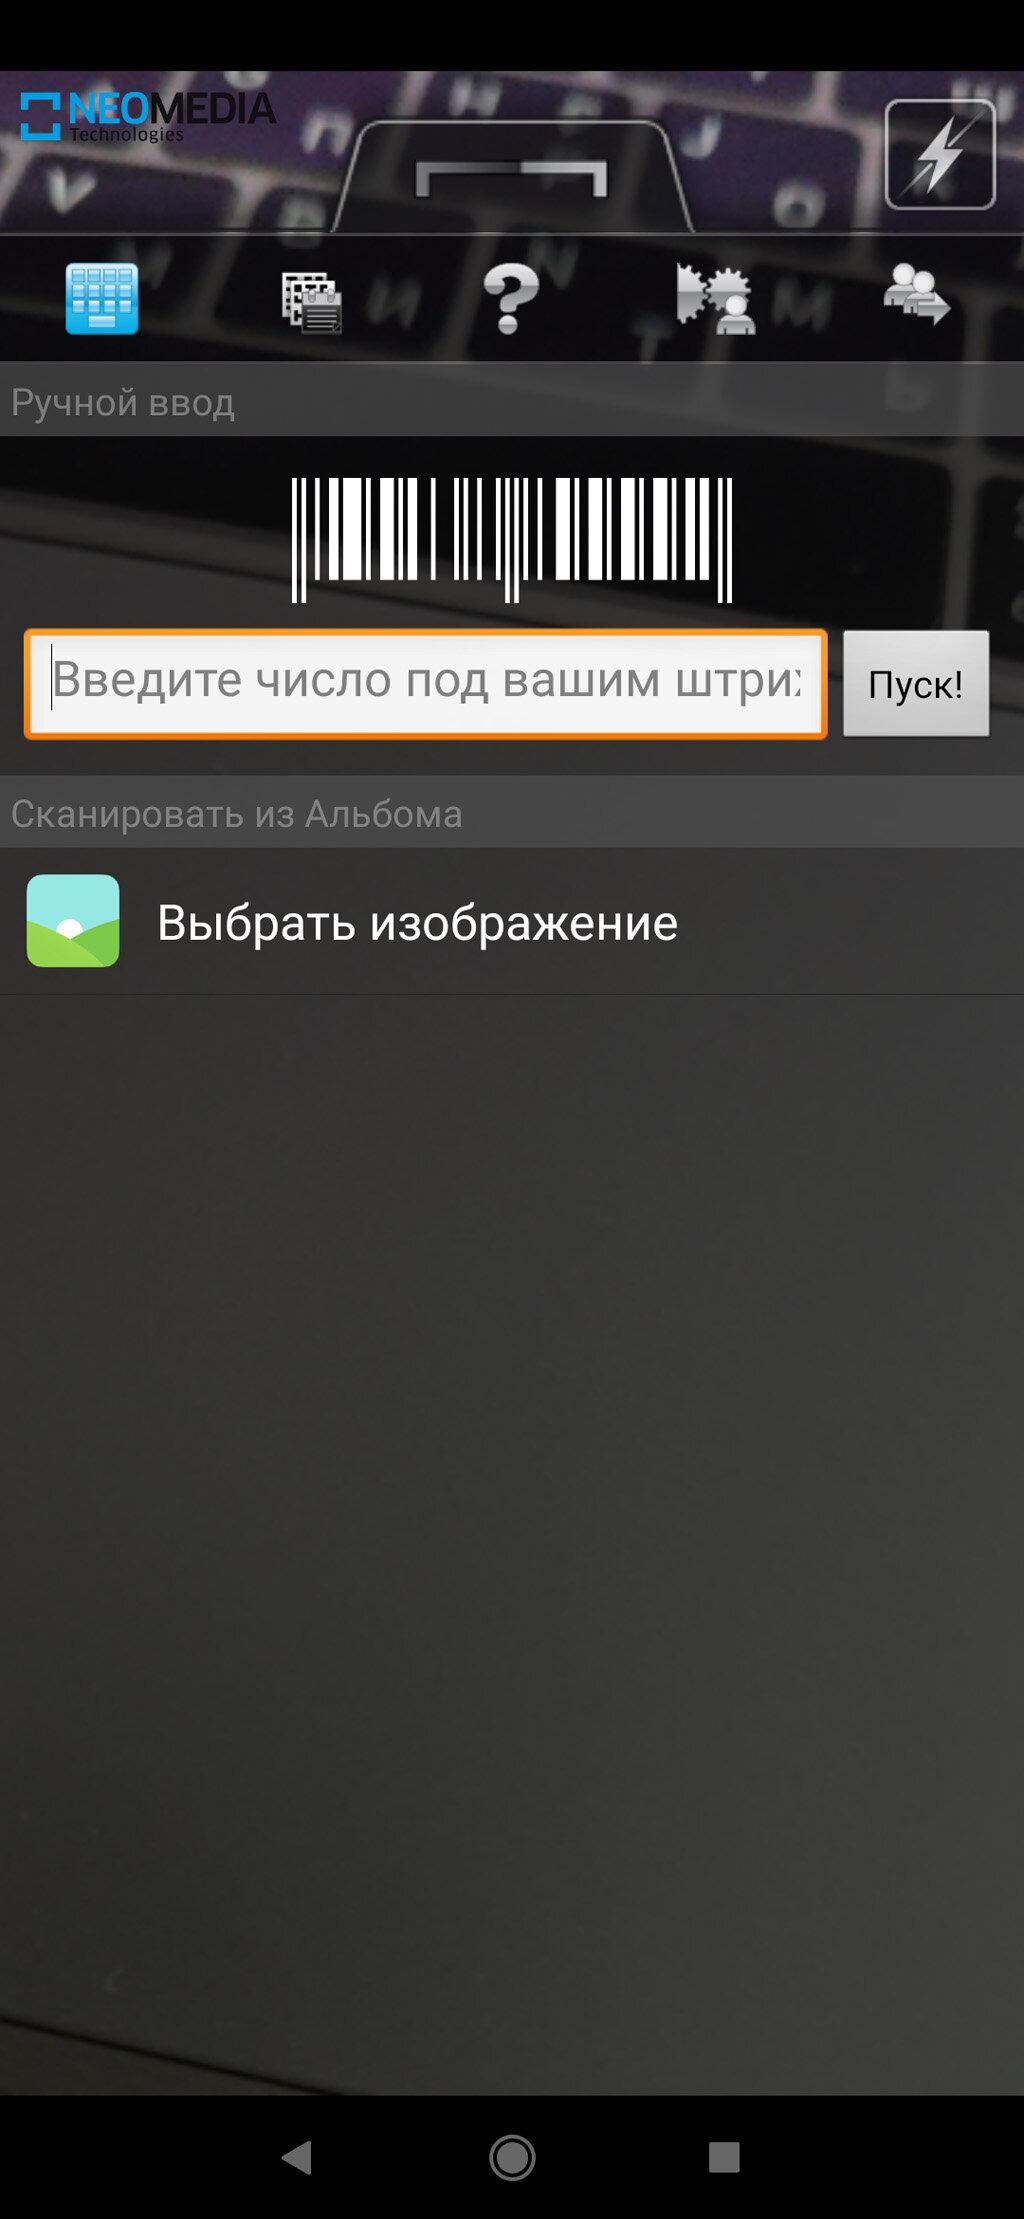 top-5-luchshih-dekoderov-qr-kodov-dlya-android-5.jpg